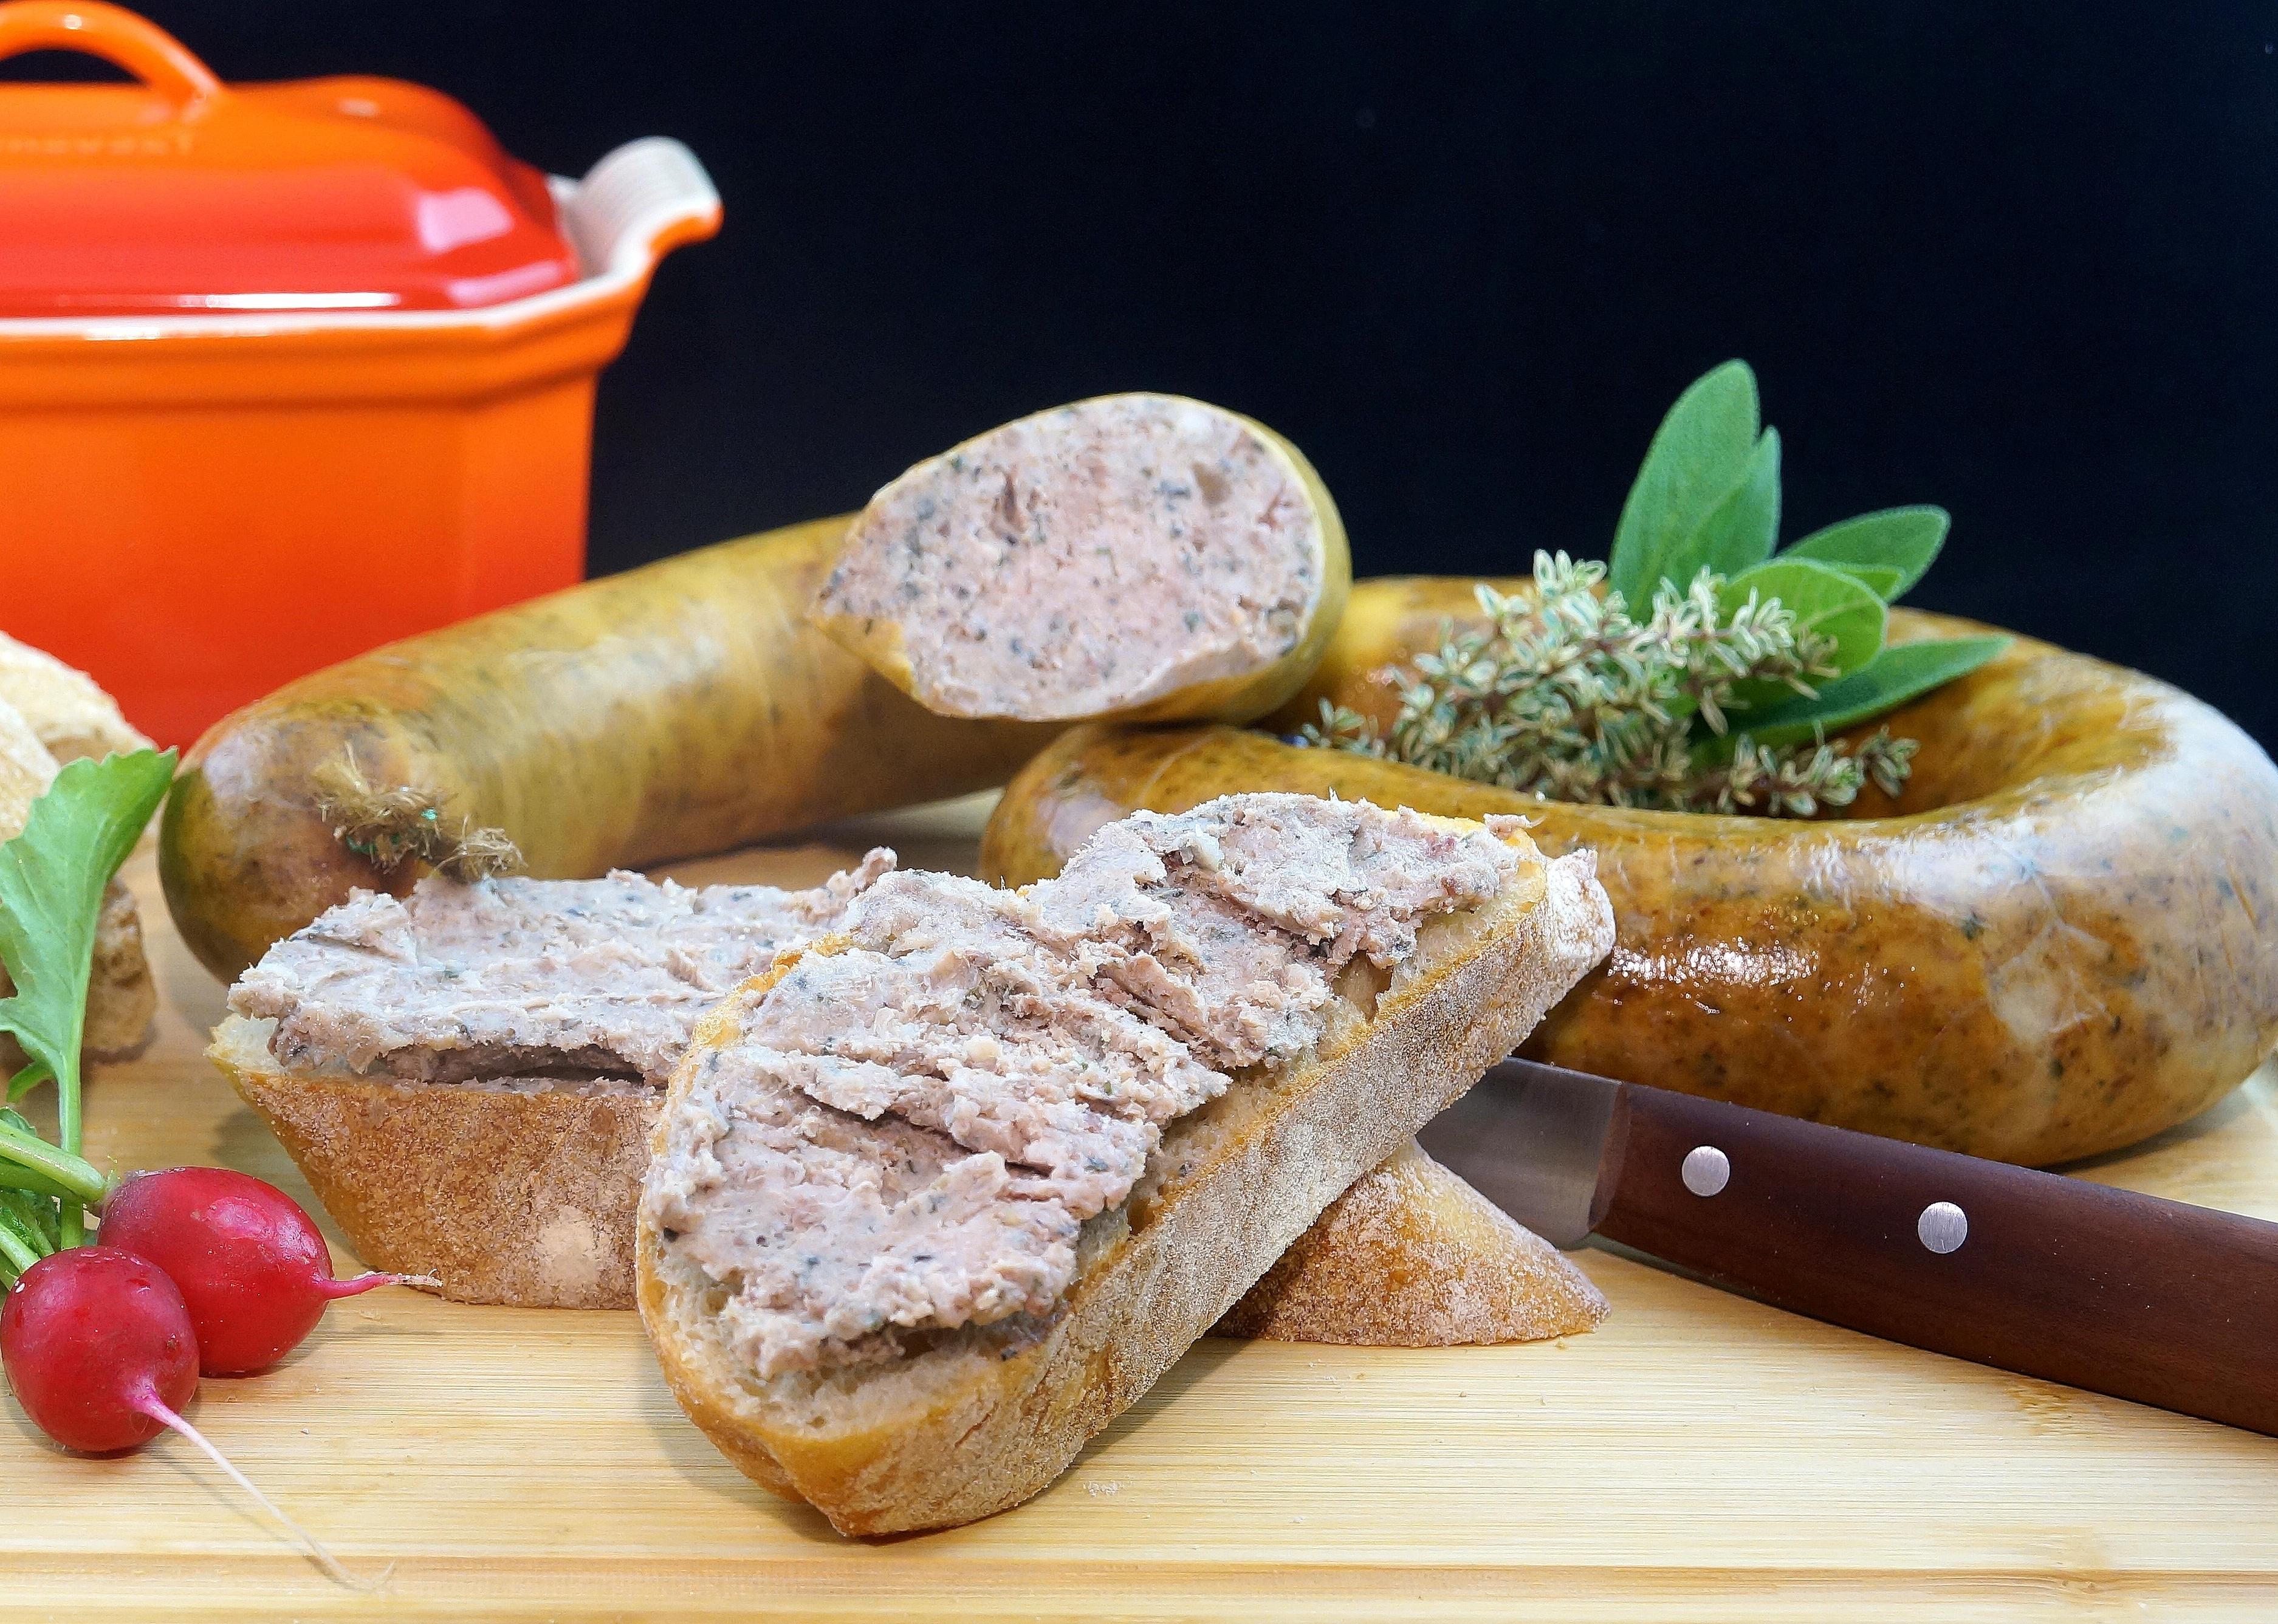 Sausage near kitchen knife photo